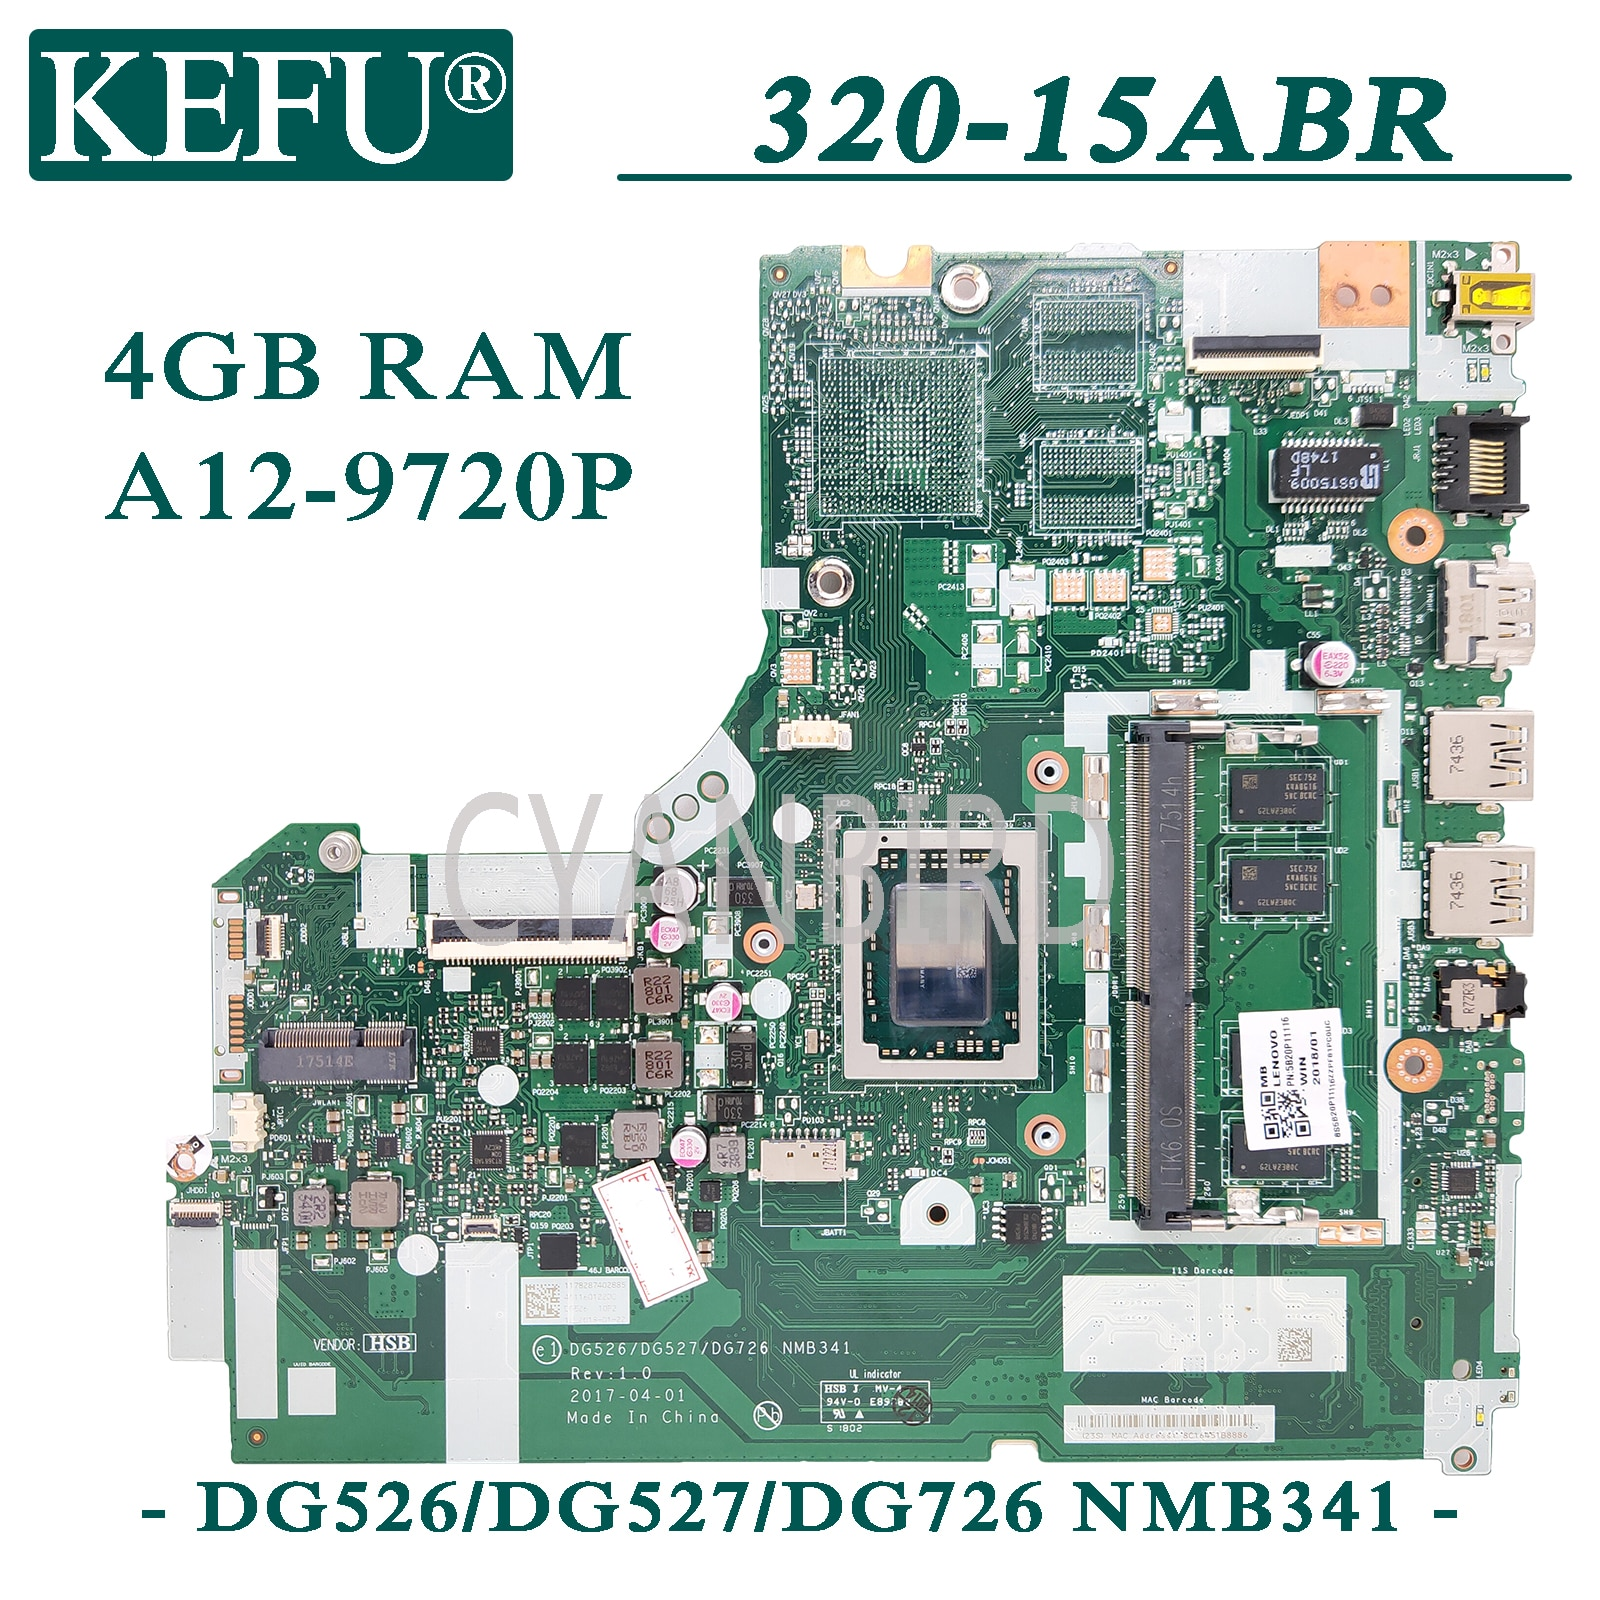 KEFU NMB341 اللوحة الرئيسية الأصلية لينوفو 320-15ABR مع 4GB-RAM A12-9720P اللوحة الأم للكمبيوتر المحمول